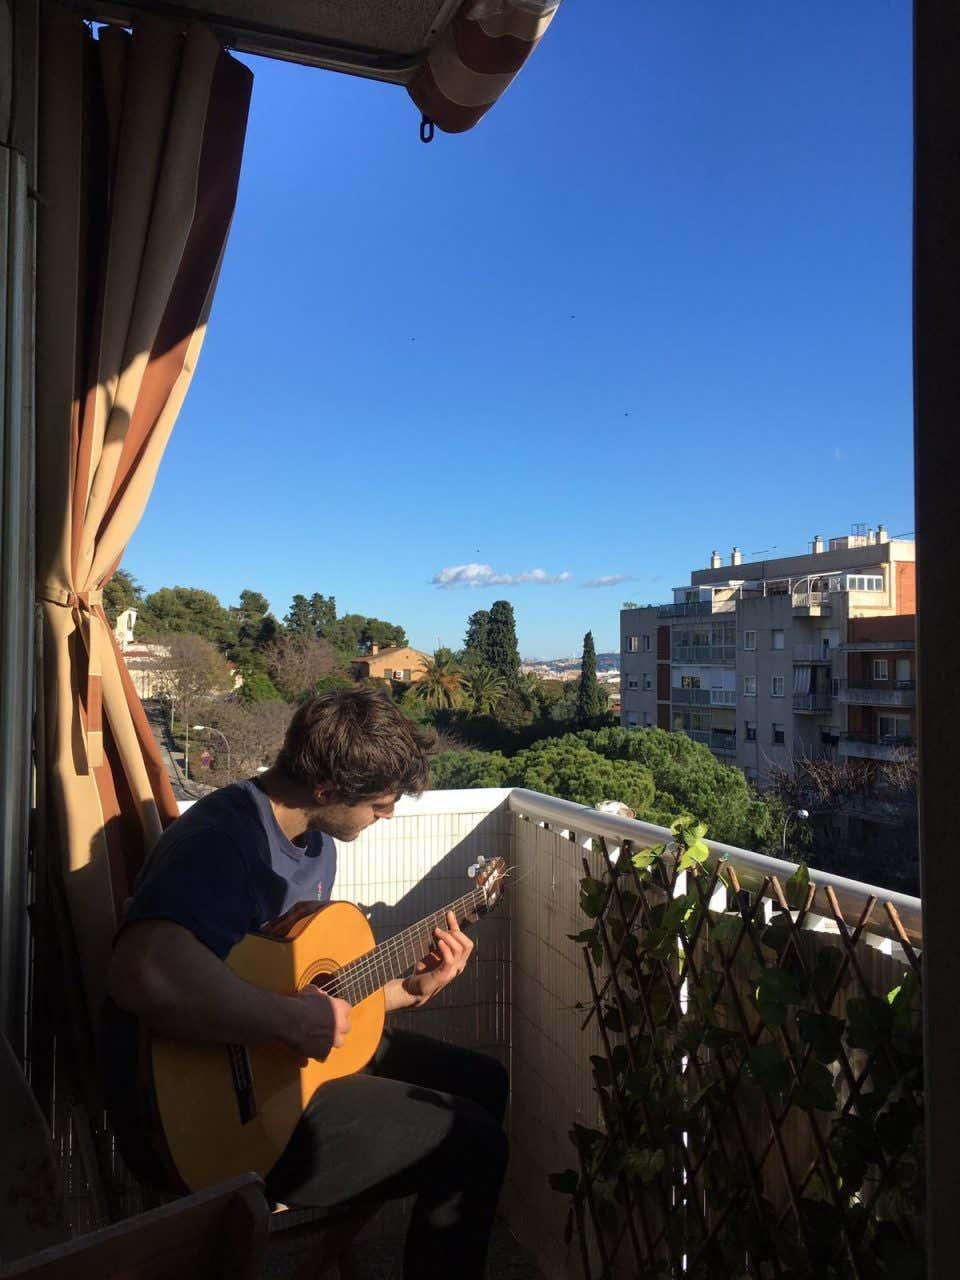 John Platt tocando la guitarra en un balcón